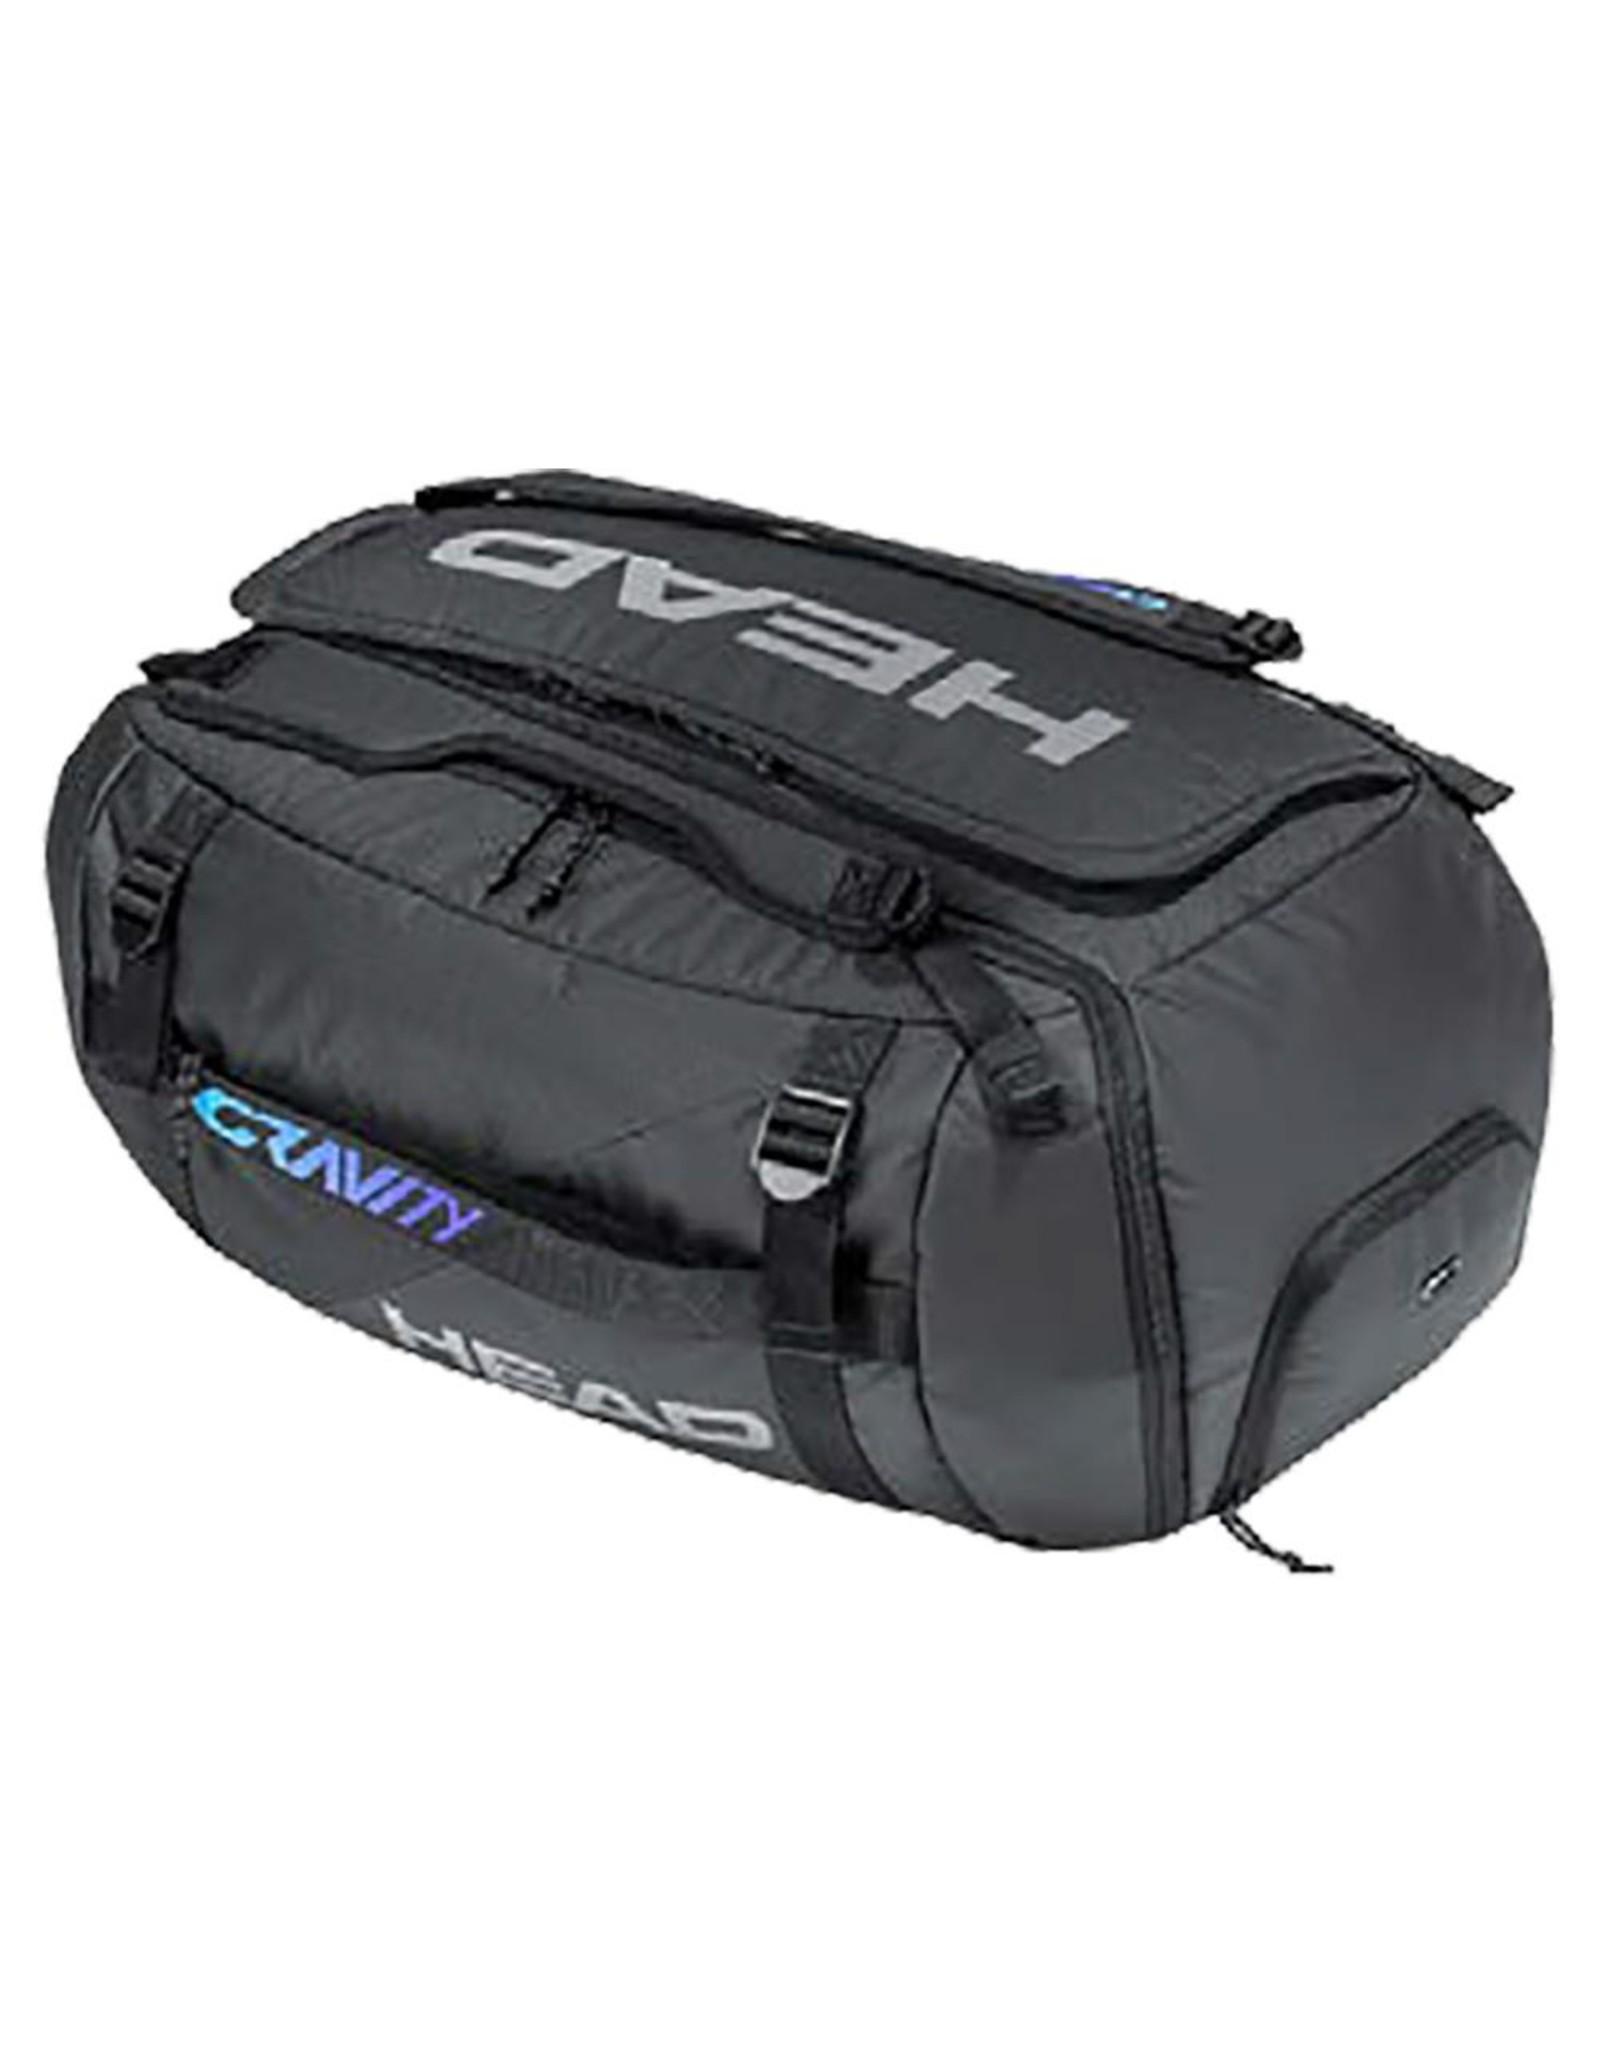 Head Head Gravity Tennis Duffle Bag Black and Mixed